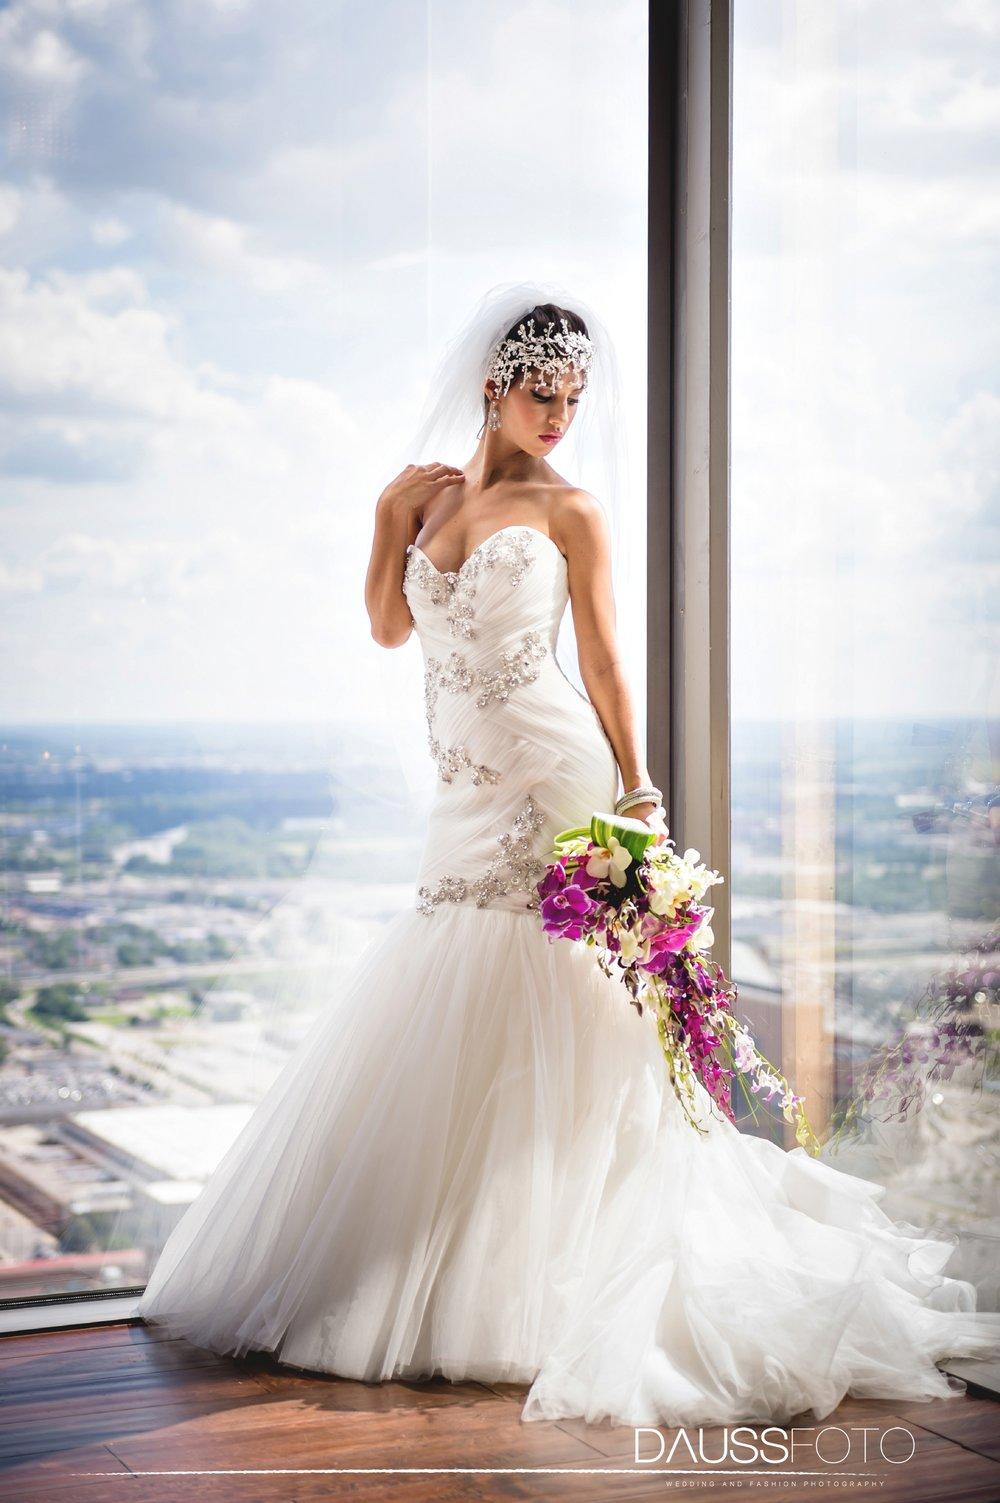 DaussFOTO_20150721_046_Indiana Wedding Photographer.jpg